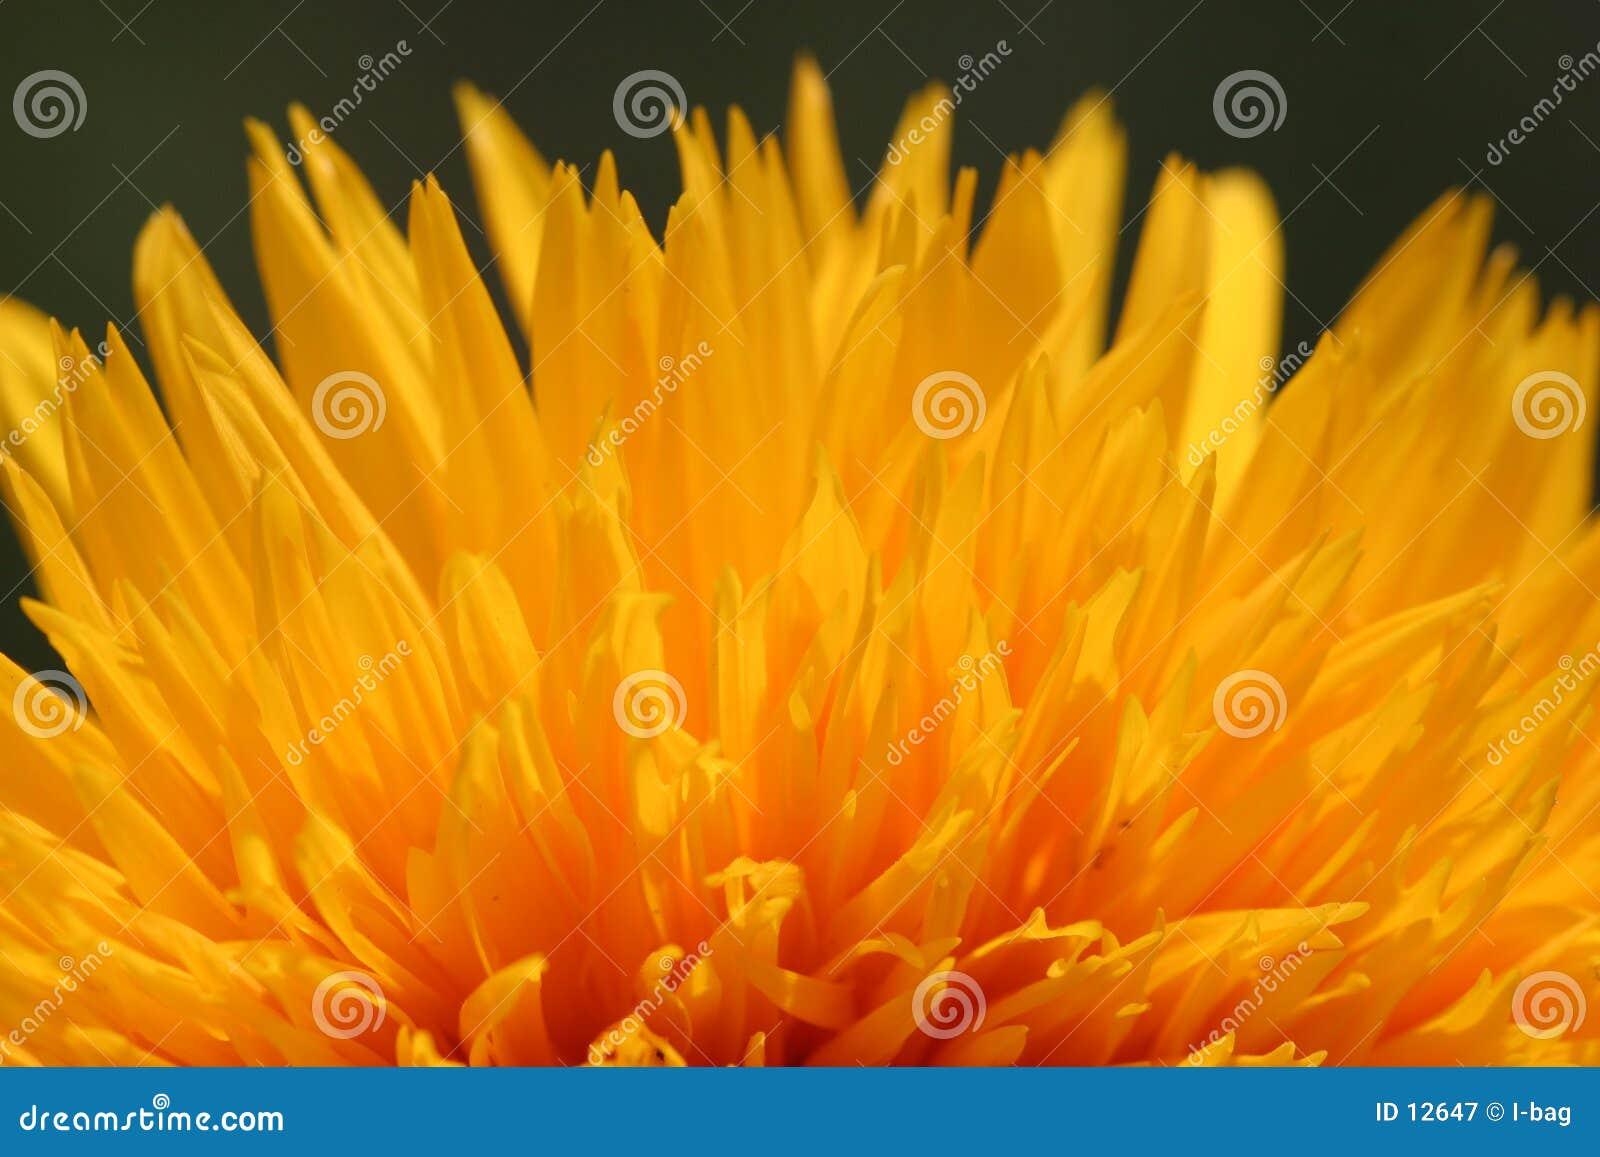 Incendie de fleur